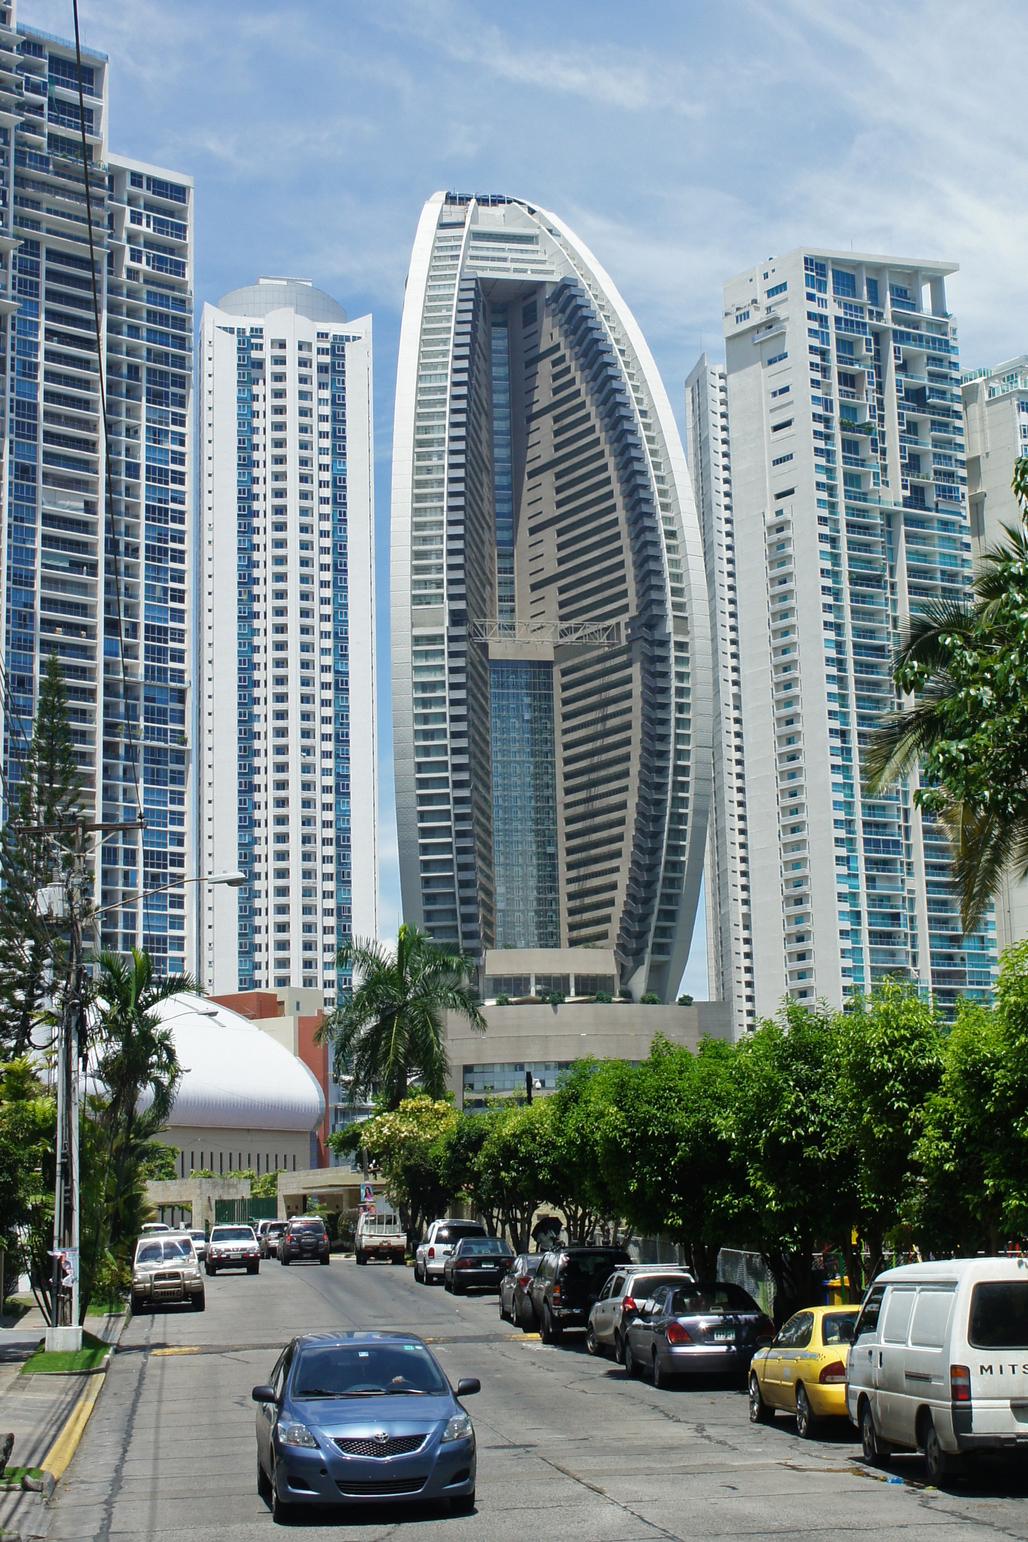 The Trump Ocean Tower in Panama. Image via wikimedia.org